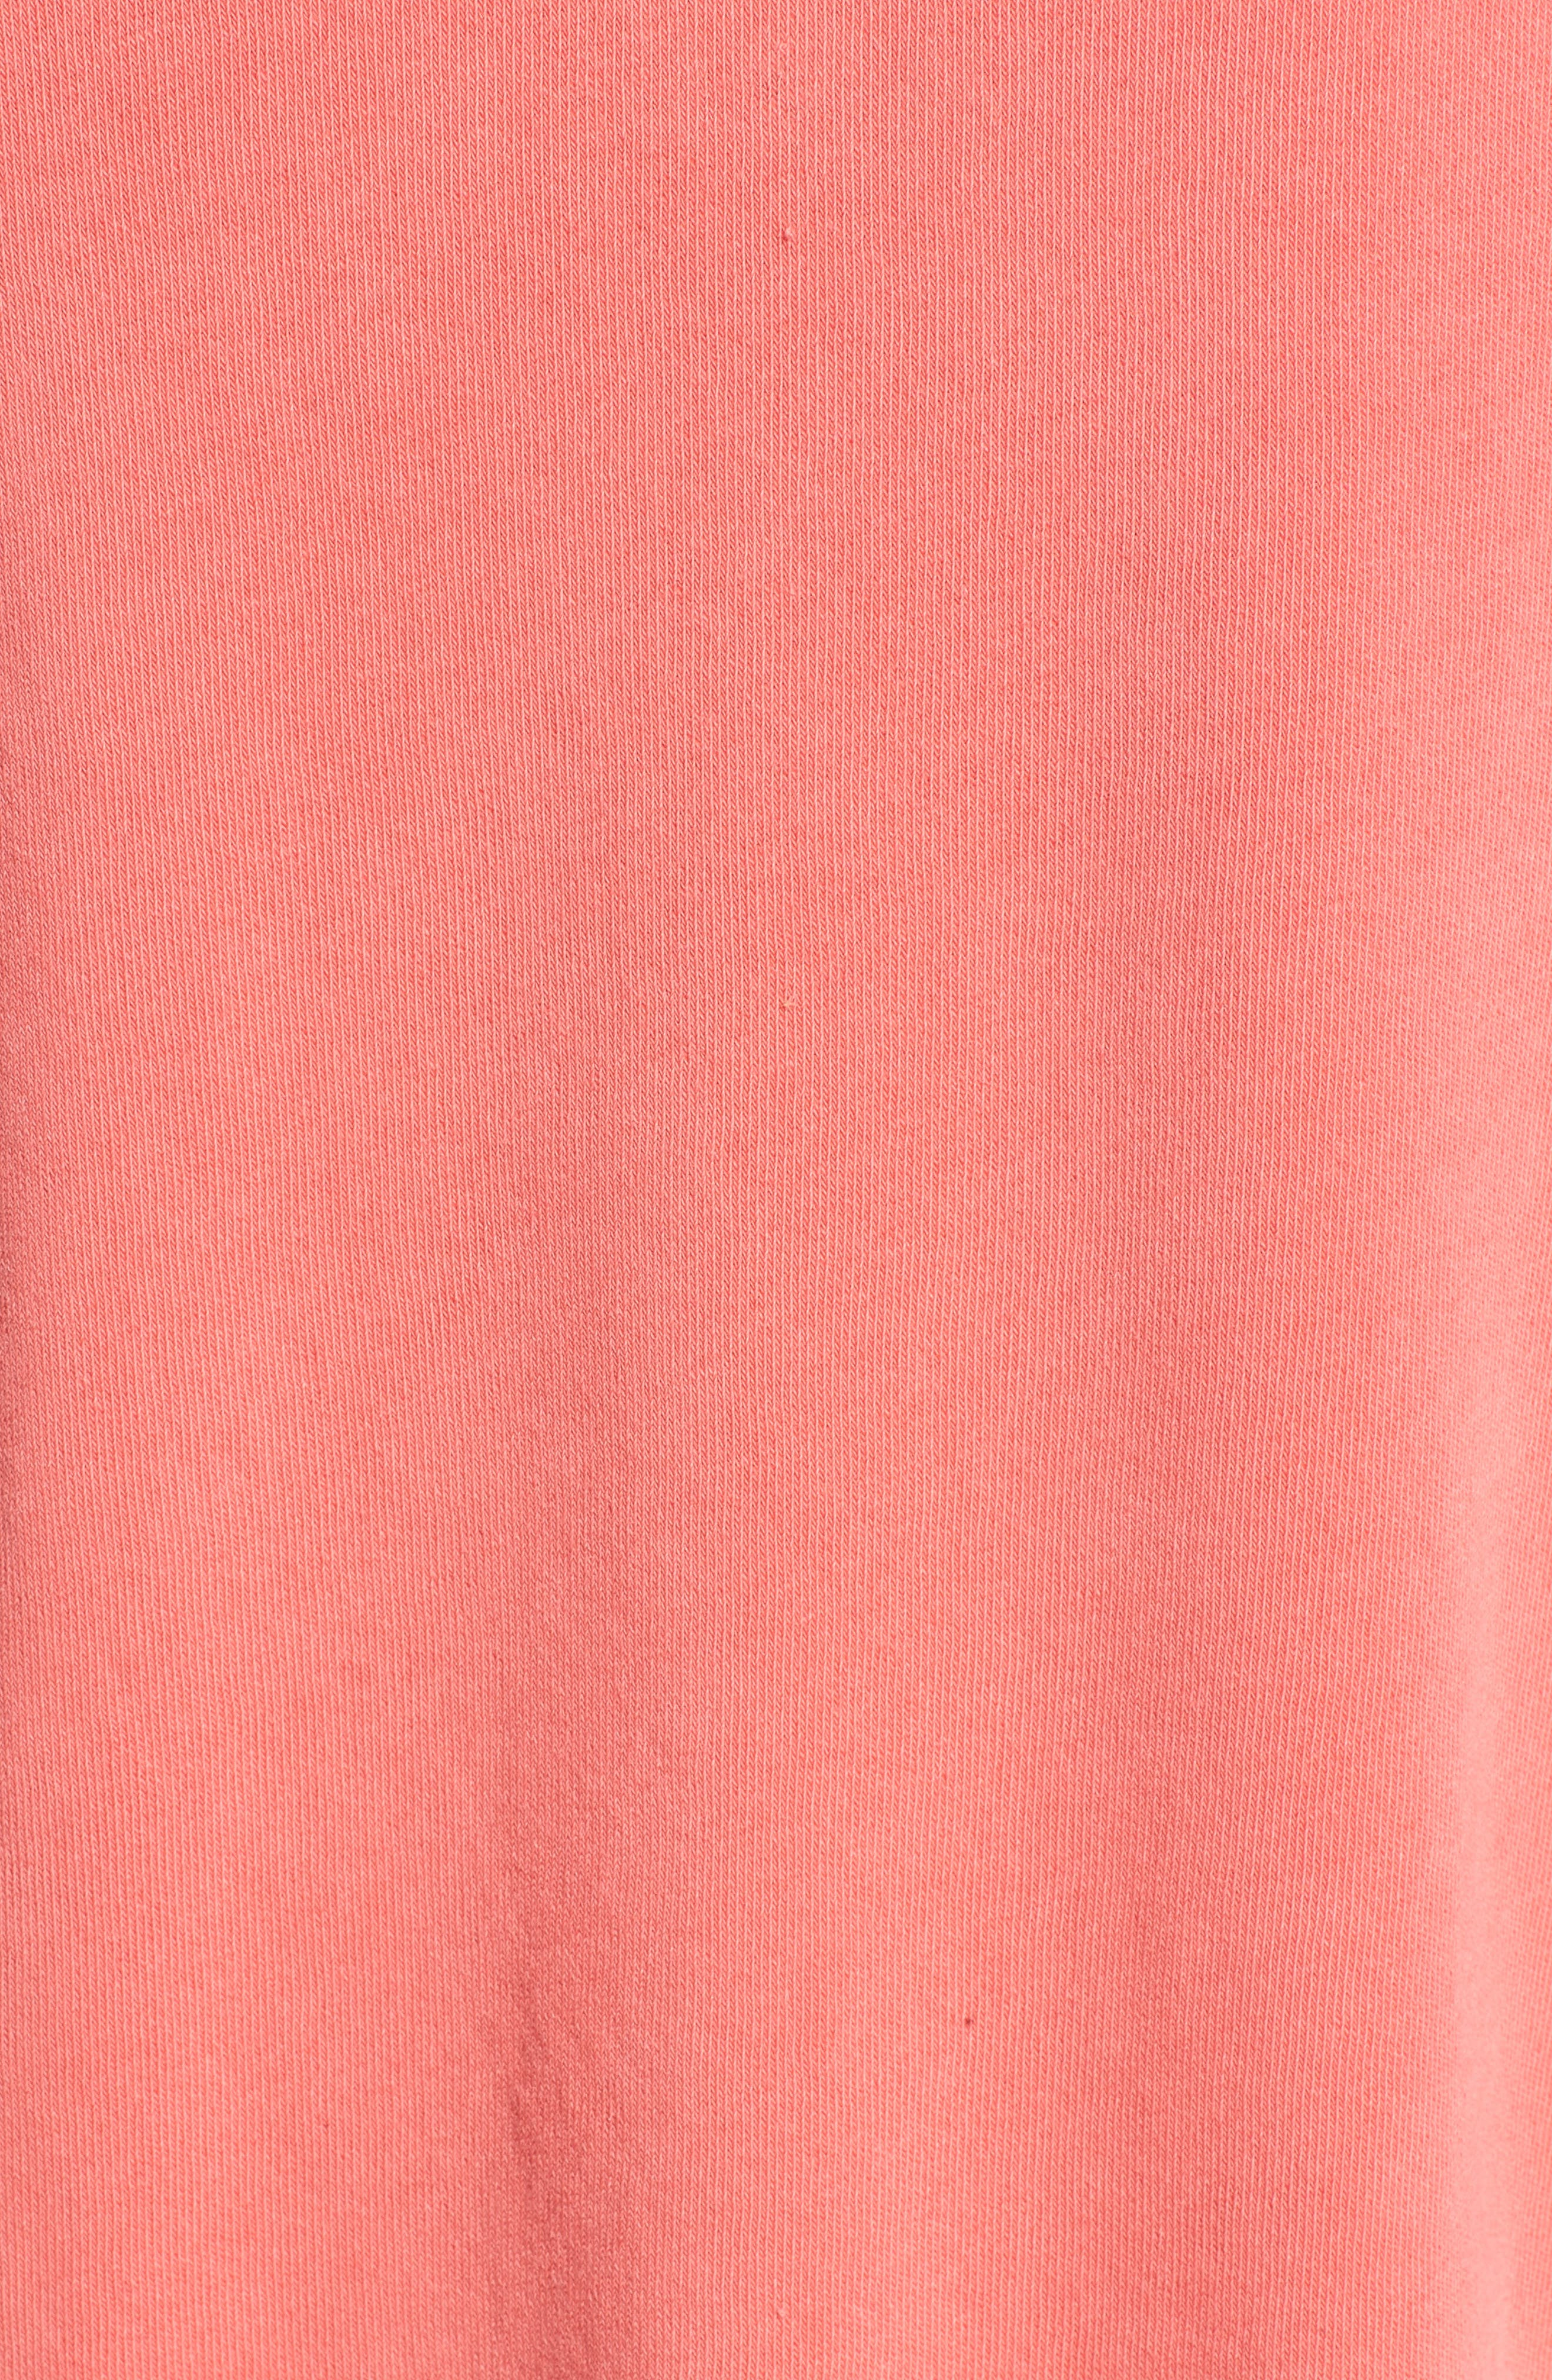 Love Me Tender Sommers Sweatshirt,                             Alternate thumbnail 5, color,                             PIGMENT HOT LIPSTICK